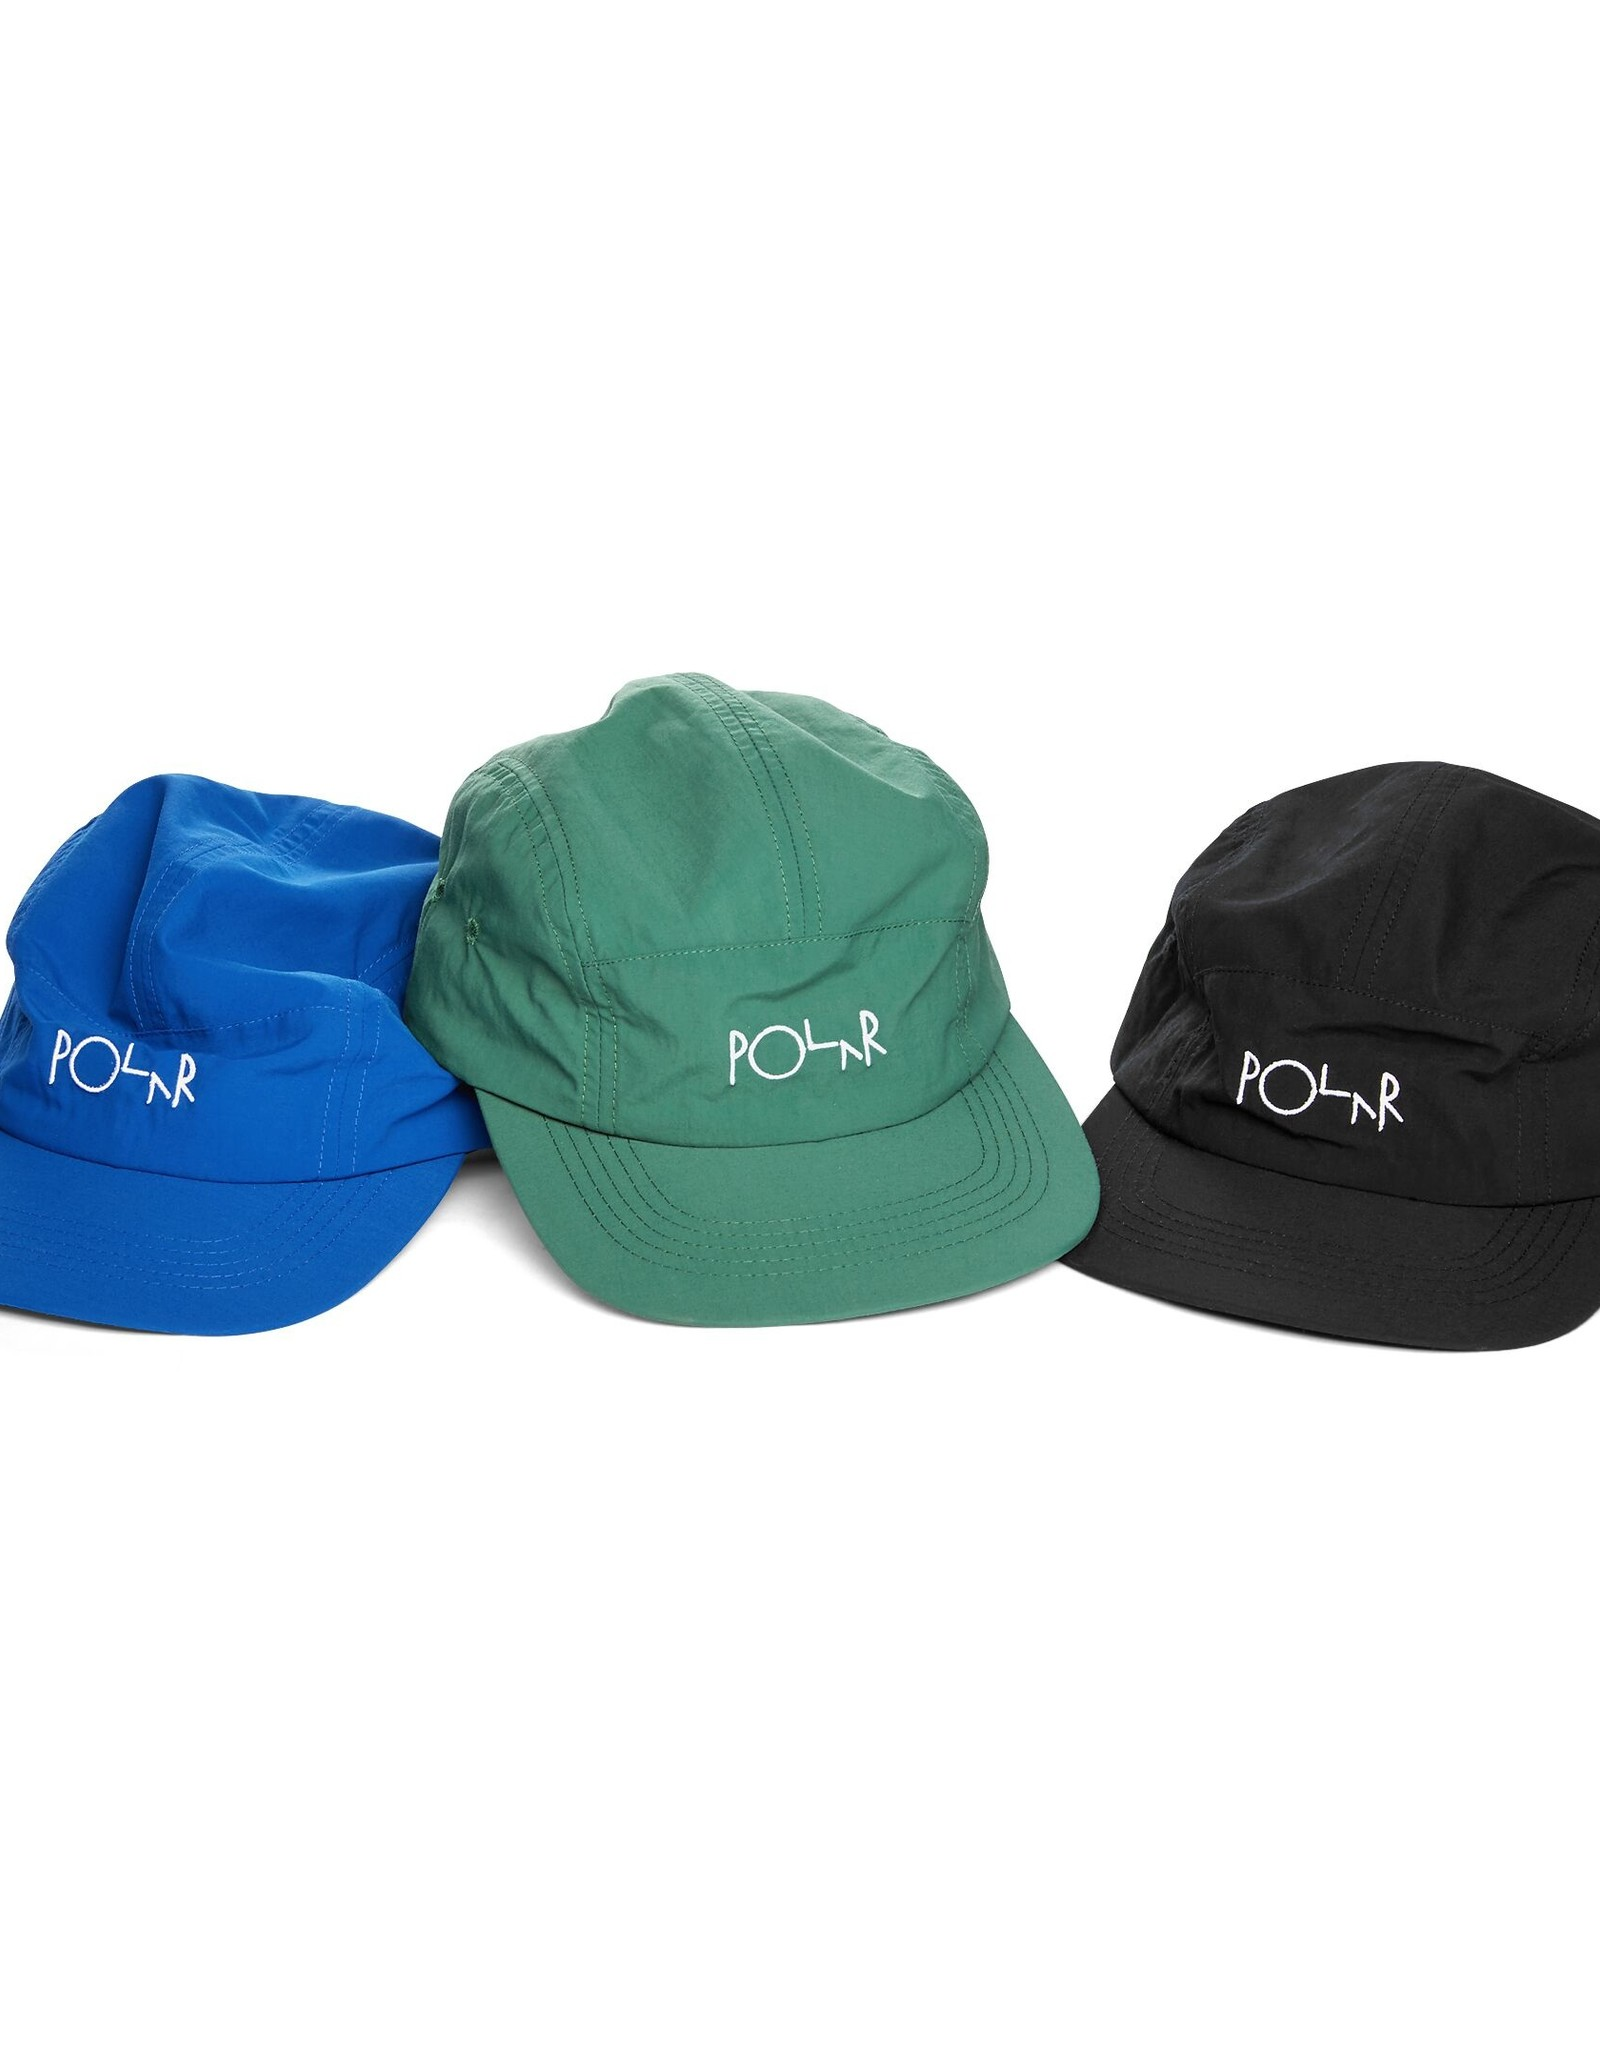 POLAR LIGHTWEIGHT SPEED CAP HAT - (ALL COLORS)